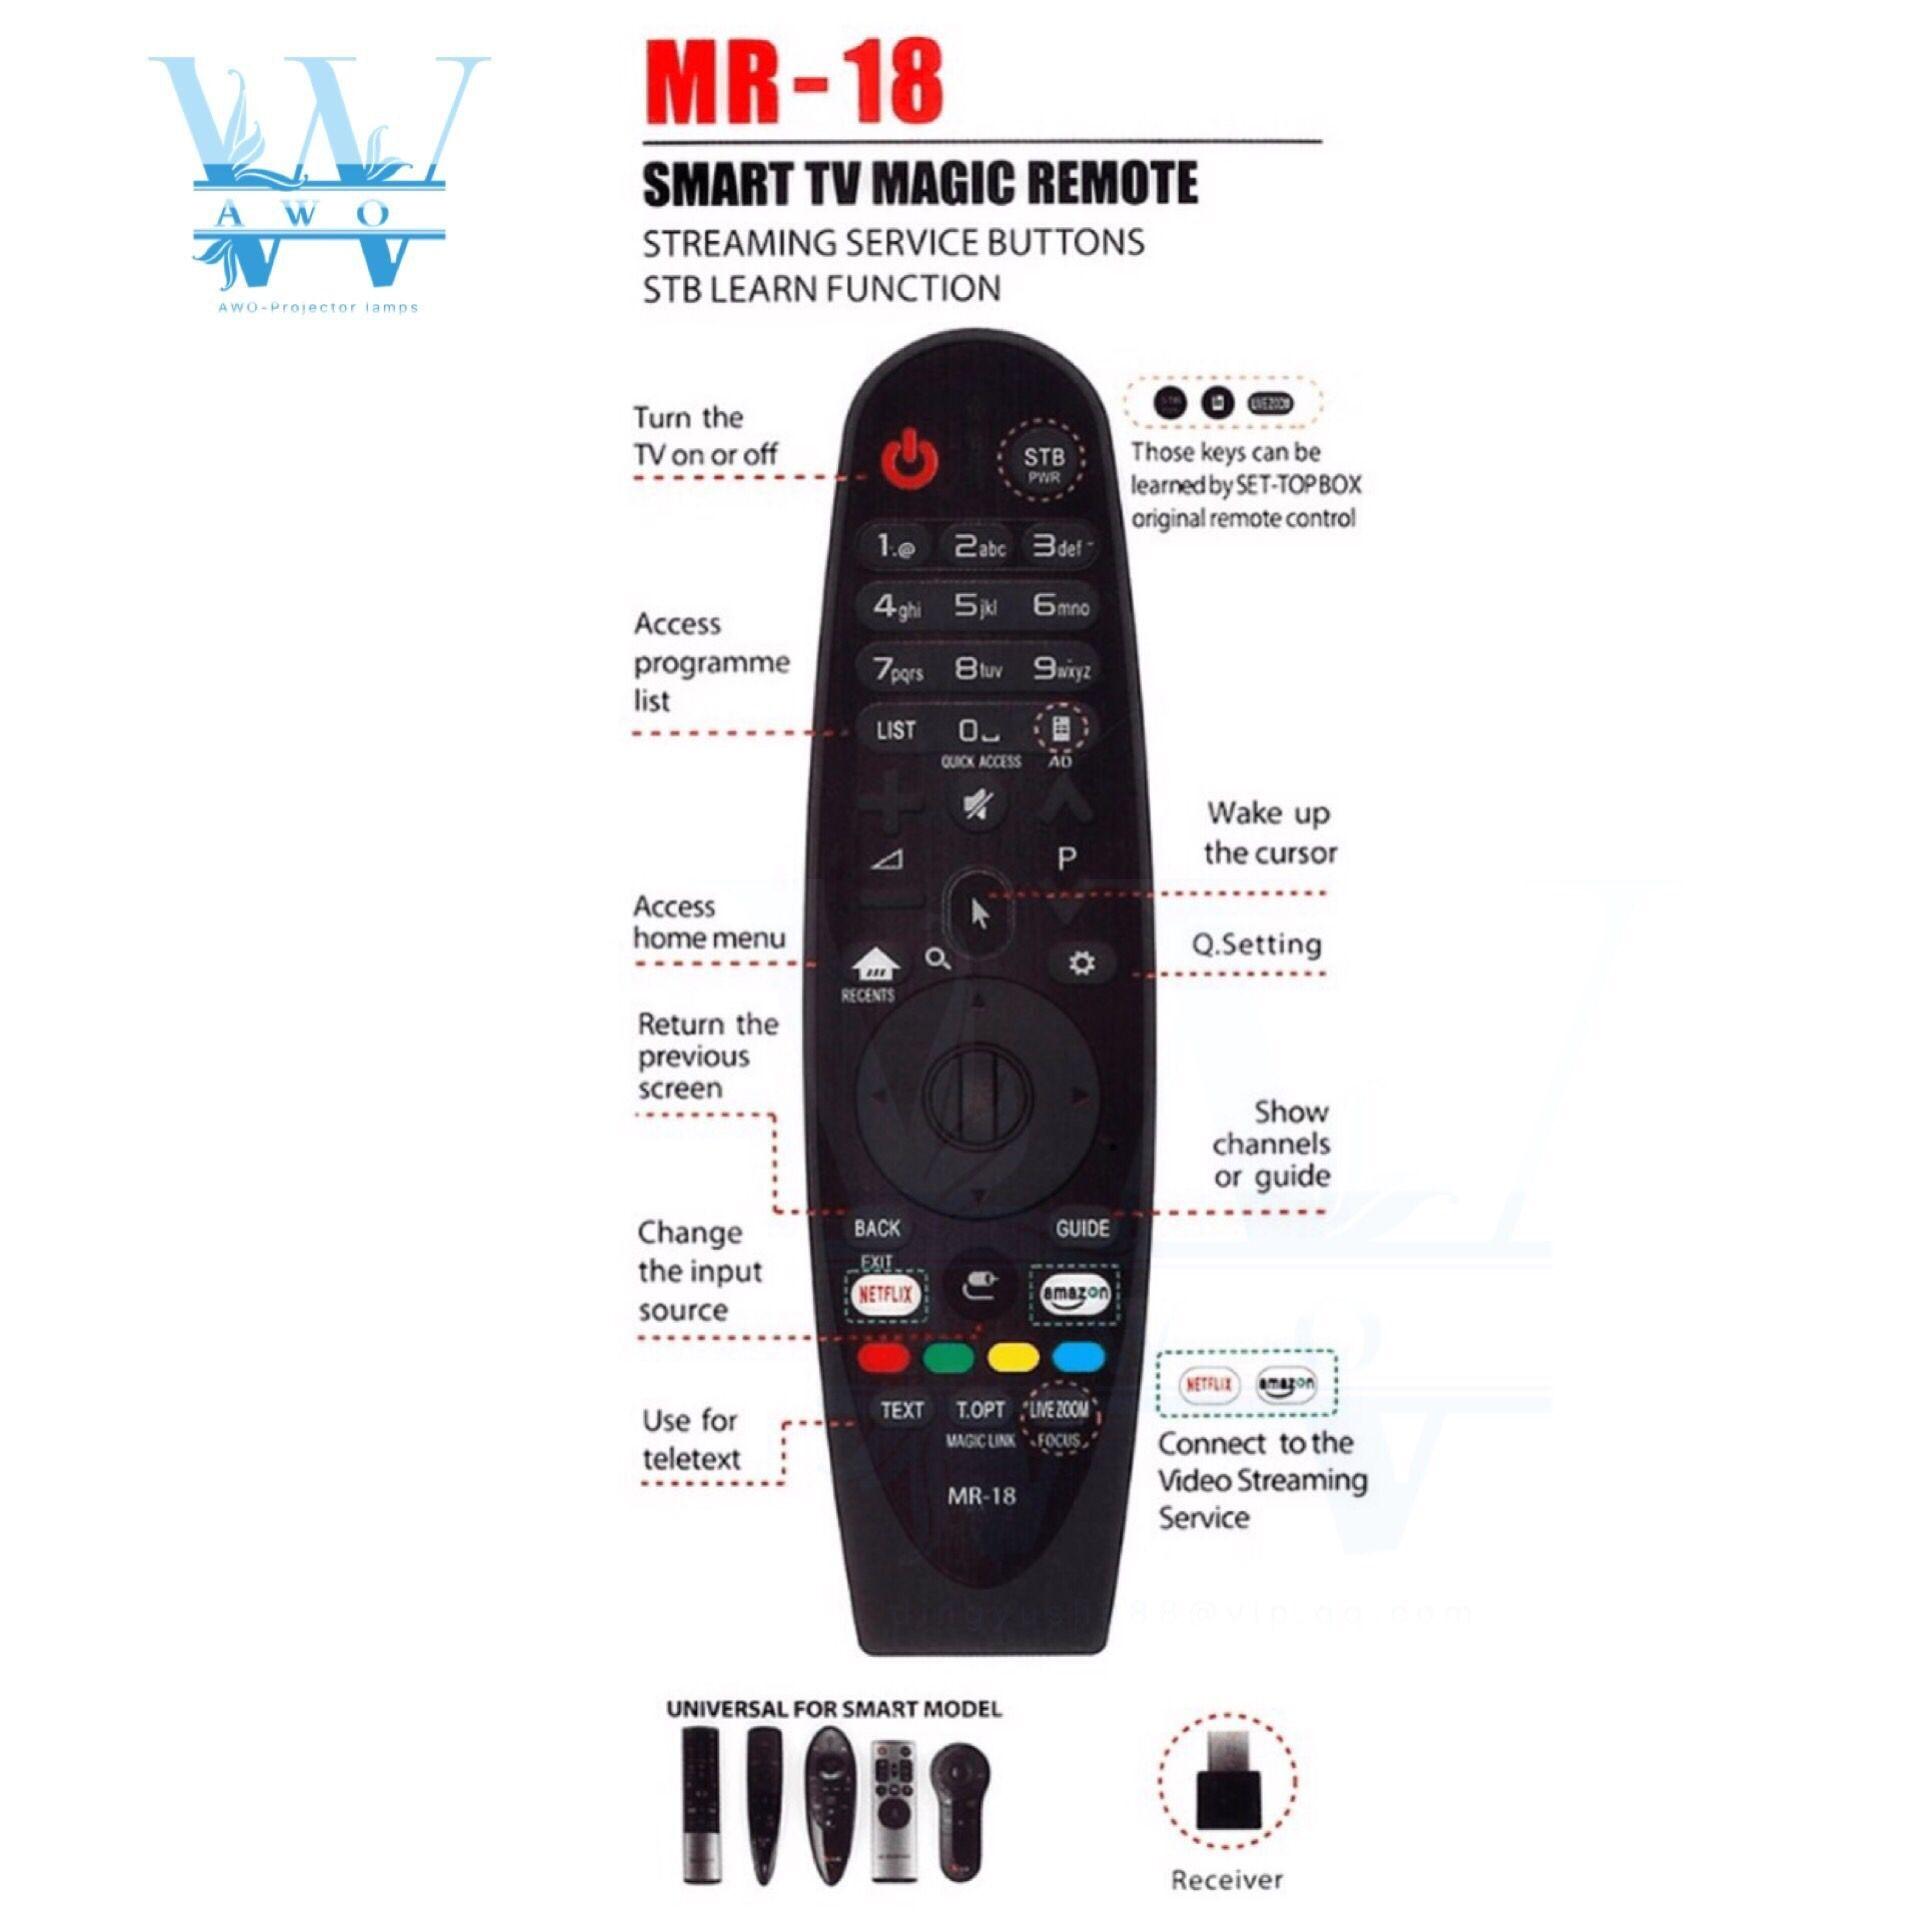 100% New MR-18 Universal Smart Magic Remote Control Fof LG TV AN-MR18BA  AKB75375501 UK6500 UK6300 UK6570 UK7700 SK8000 SK8070